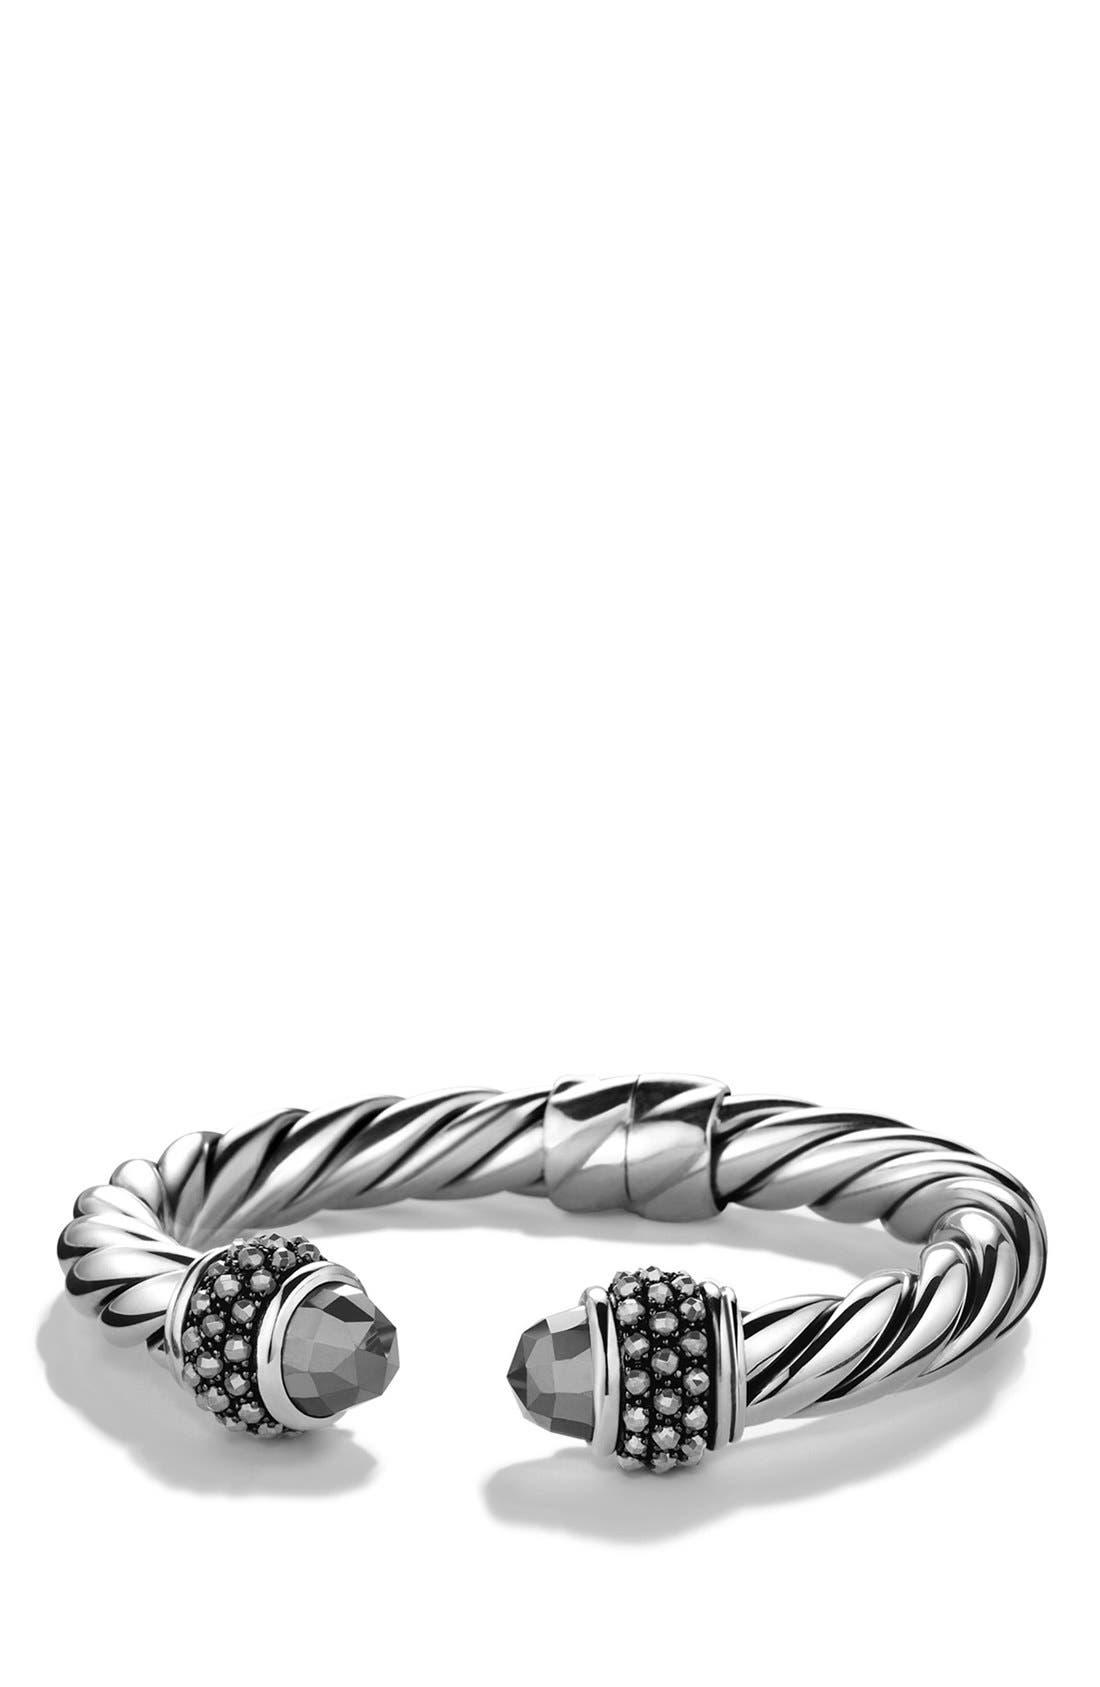 Bracelet with Semiprecious Stones, 10mm,                         Main,                         color, Hematine